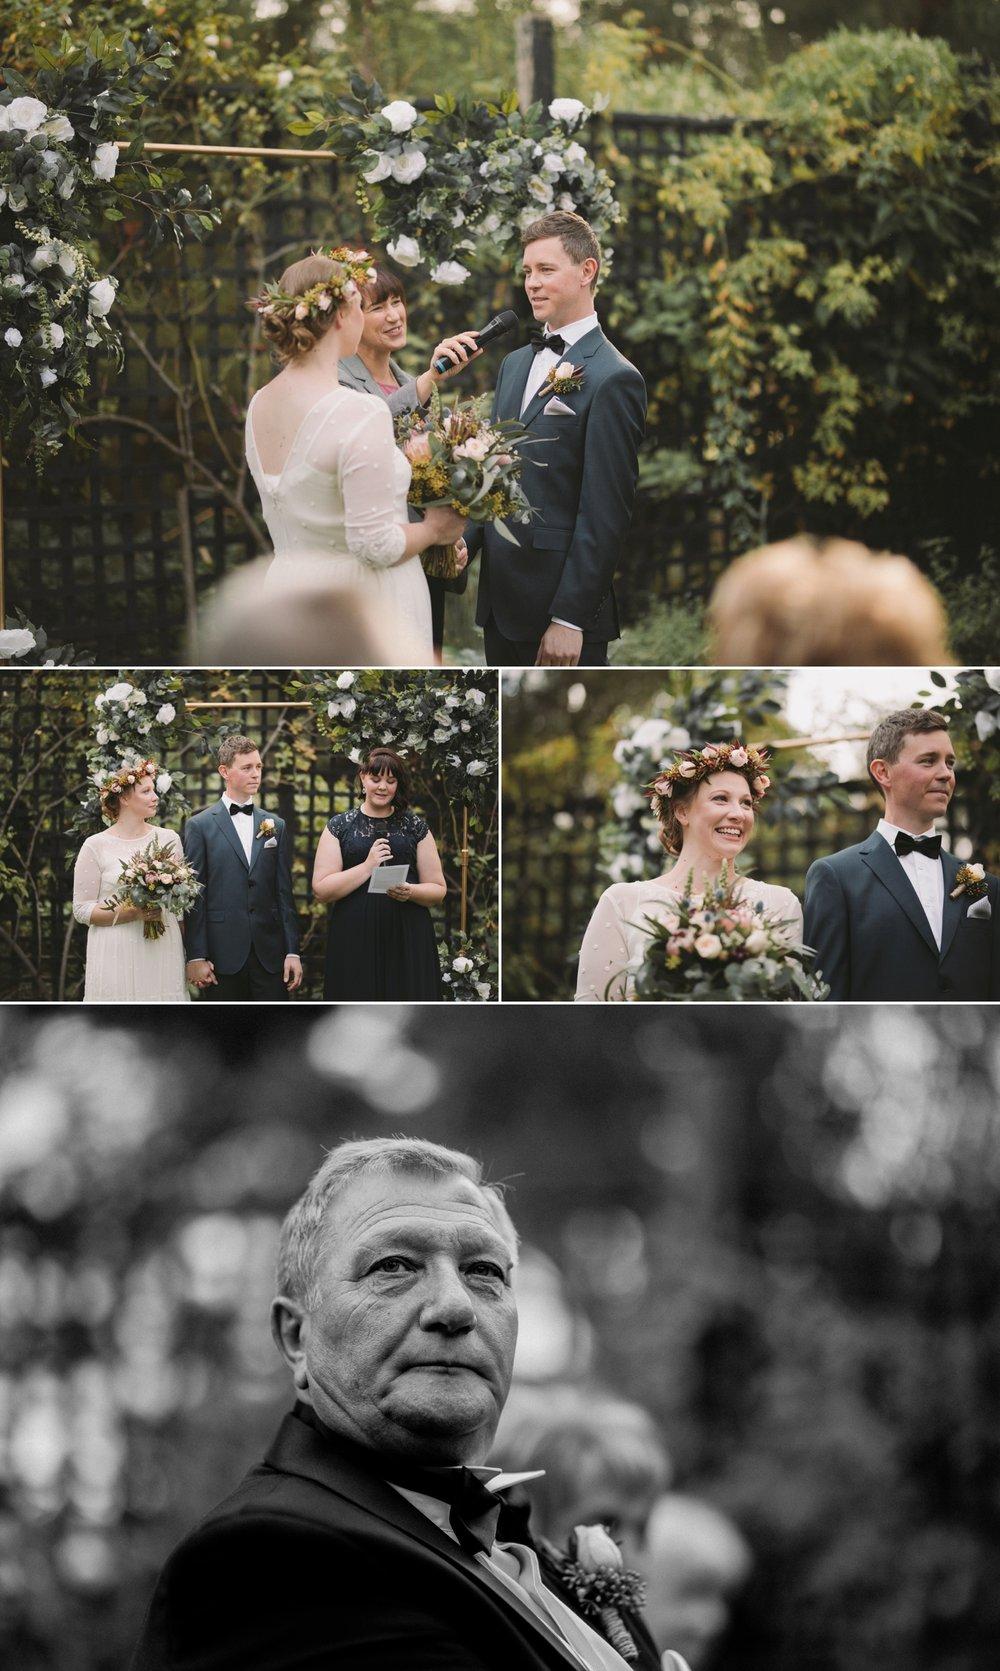 Jo & Aaron - Natural Wedding Photography in Adelaide - Beautiful, modern wedding photographer - Al Ru Farm Wedding Photography - Katherine Schultz_0015.jpg